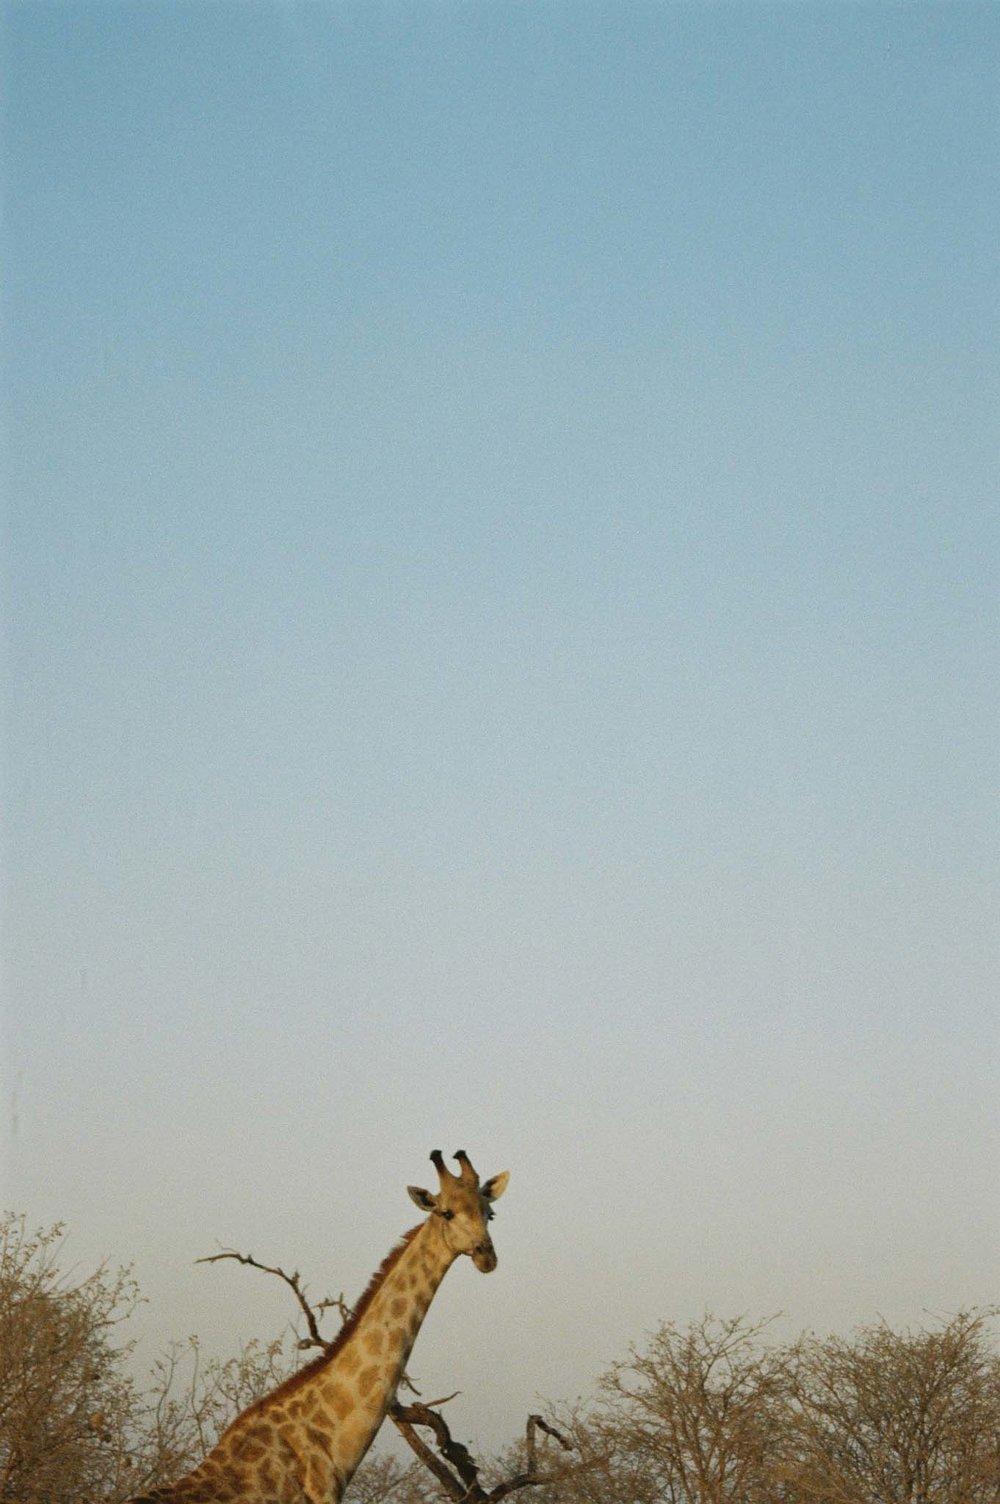 Africa_8339_13.jpg